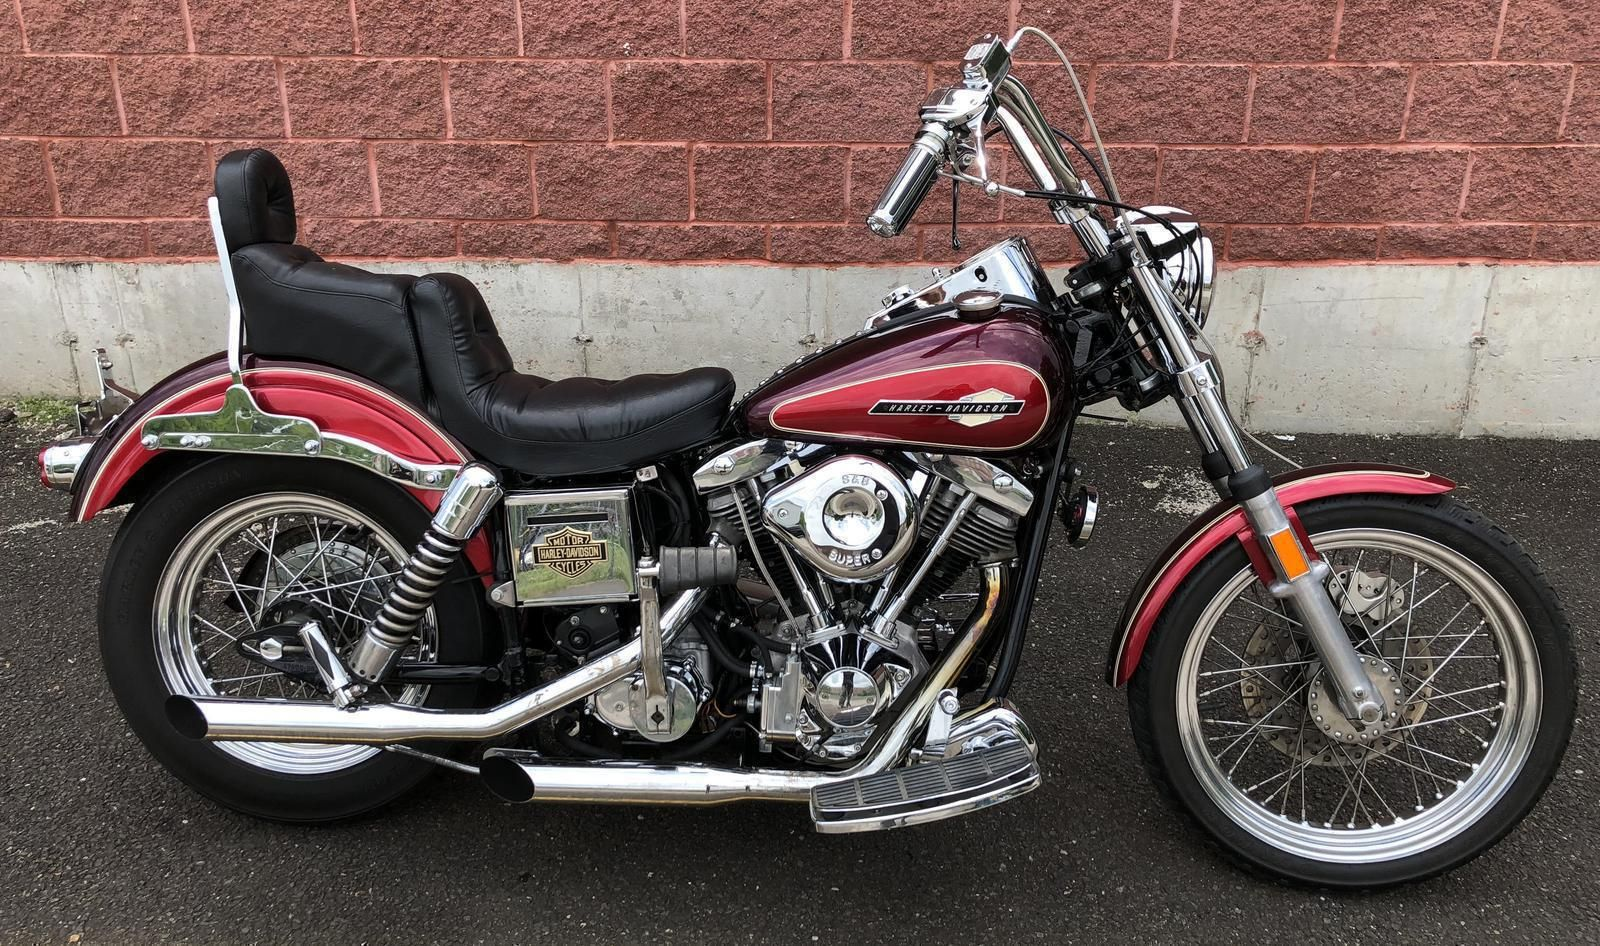 Old Harley Davidson Old Harley Davidson Harley Bikes Harley Davidson